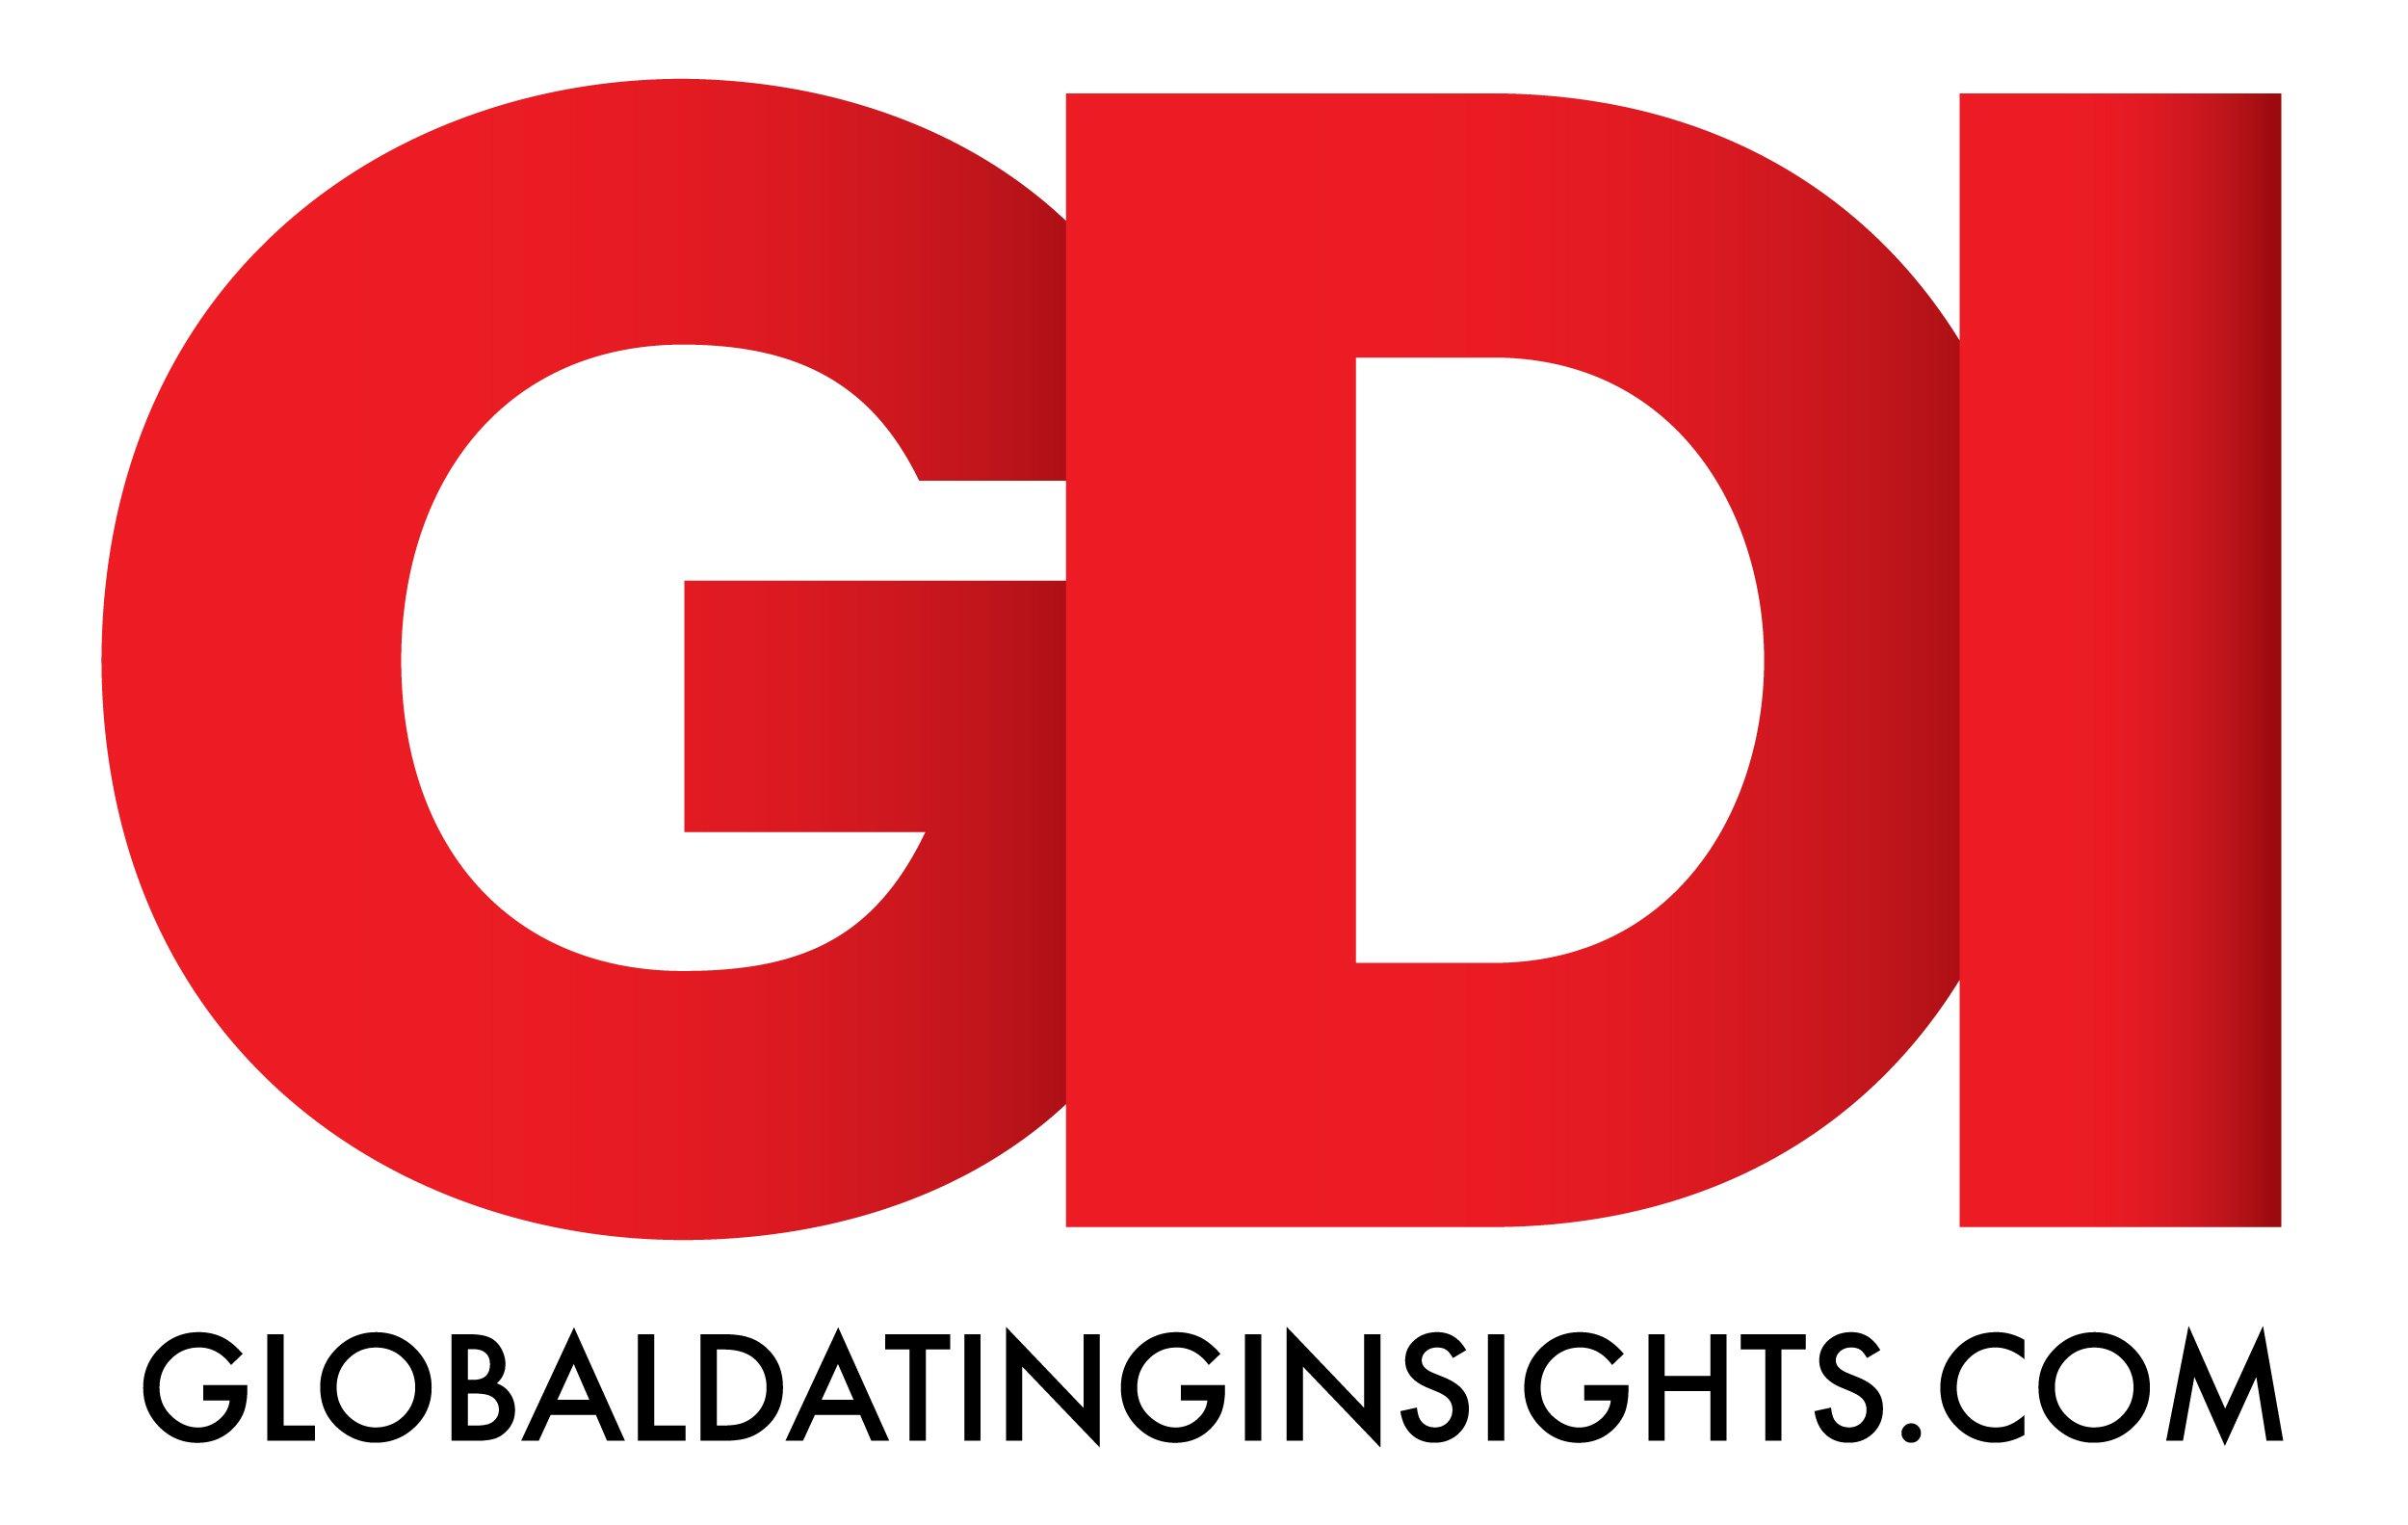 Global Dating Insights Logo.jpg